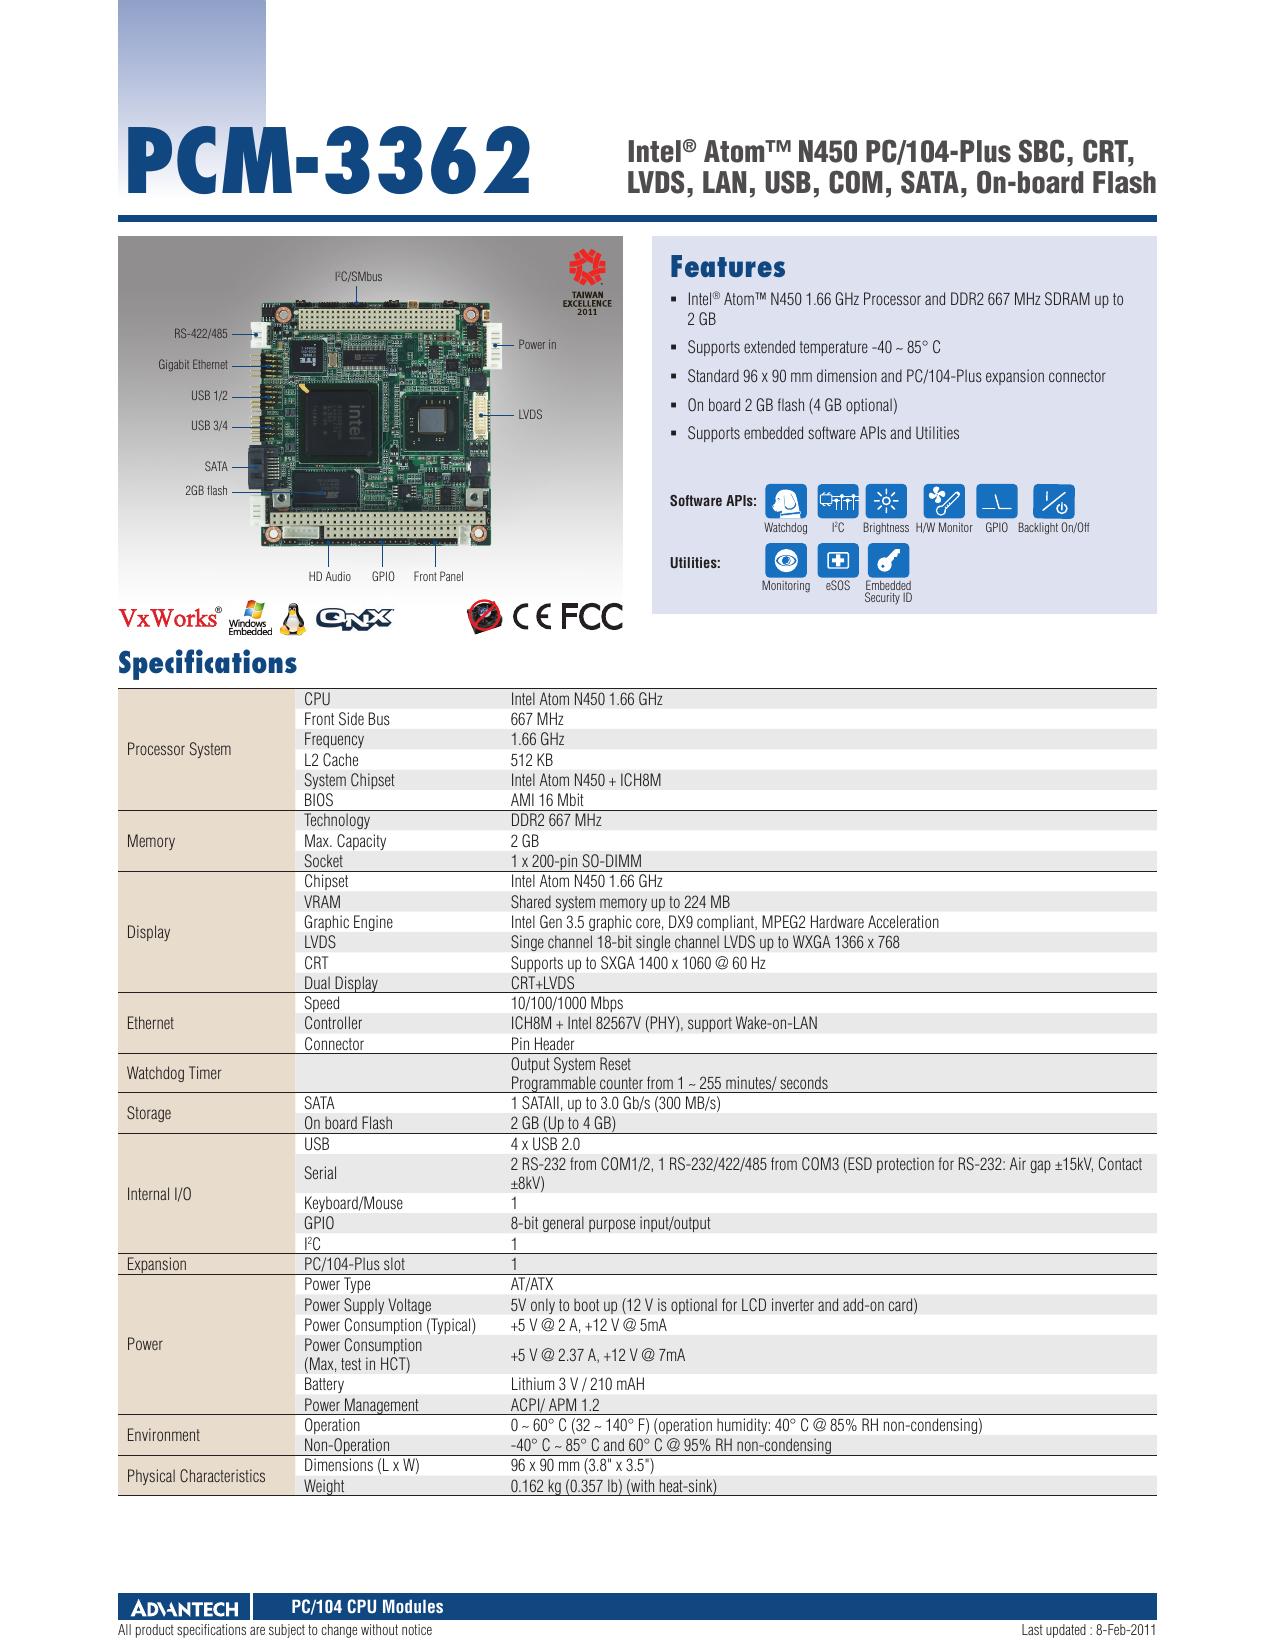 Features PCM-3362 Intel® Atom™ N450 PC/104-Plus SBC | manualzz com